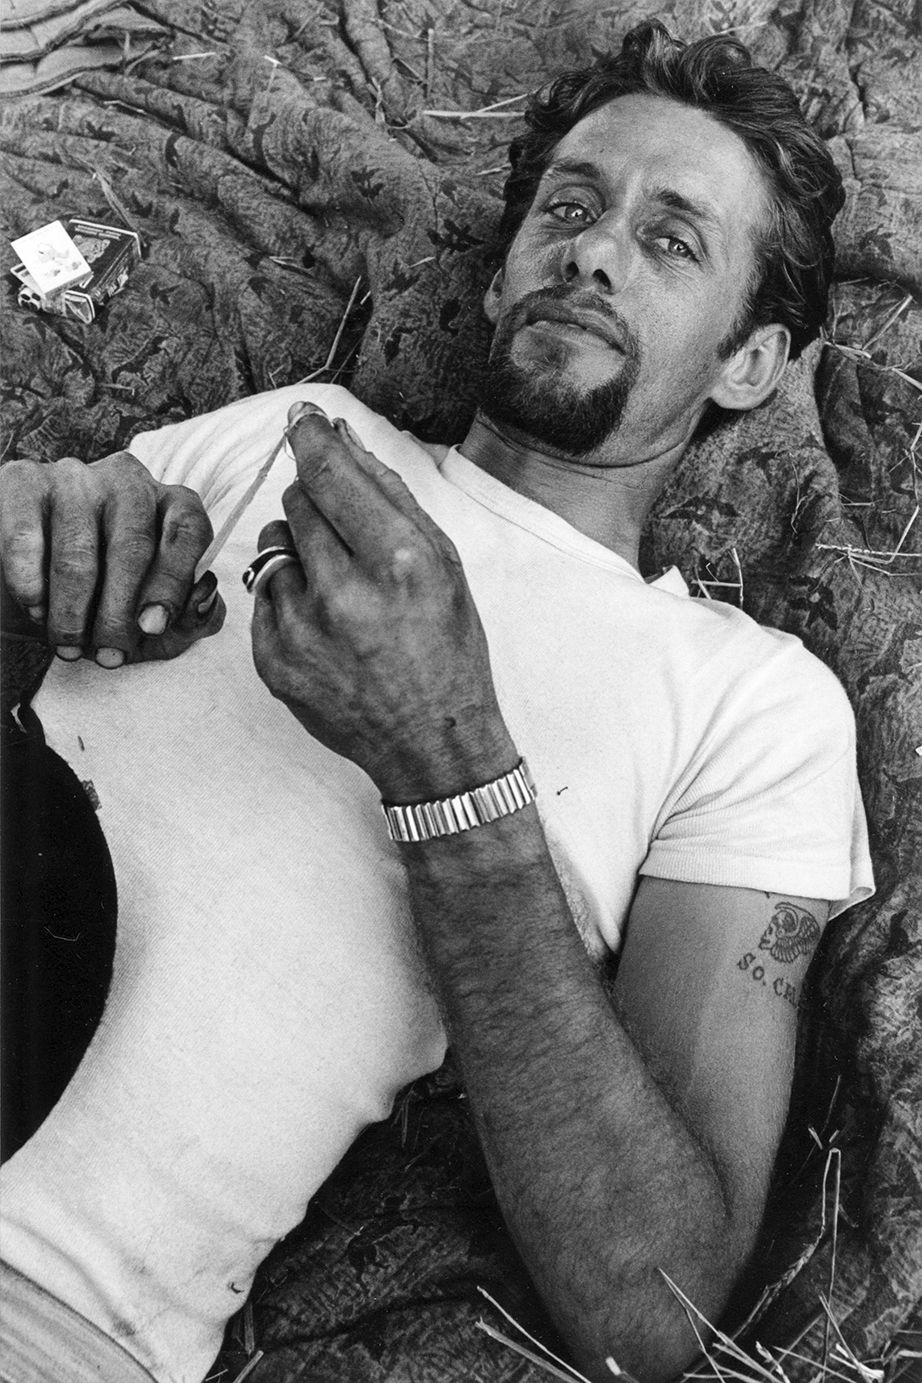 Copyright Danny Lyon / Magnum Photos, Cal, Springfield, Illinois, from The Bikeriders, 1966